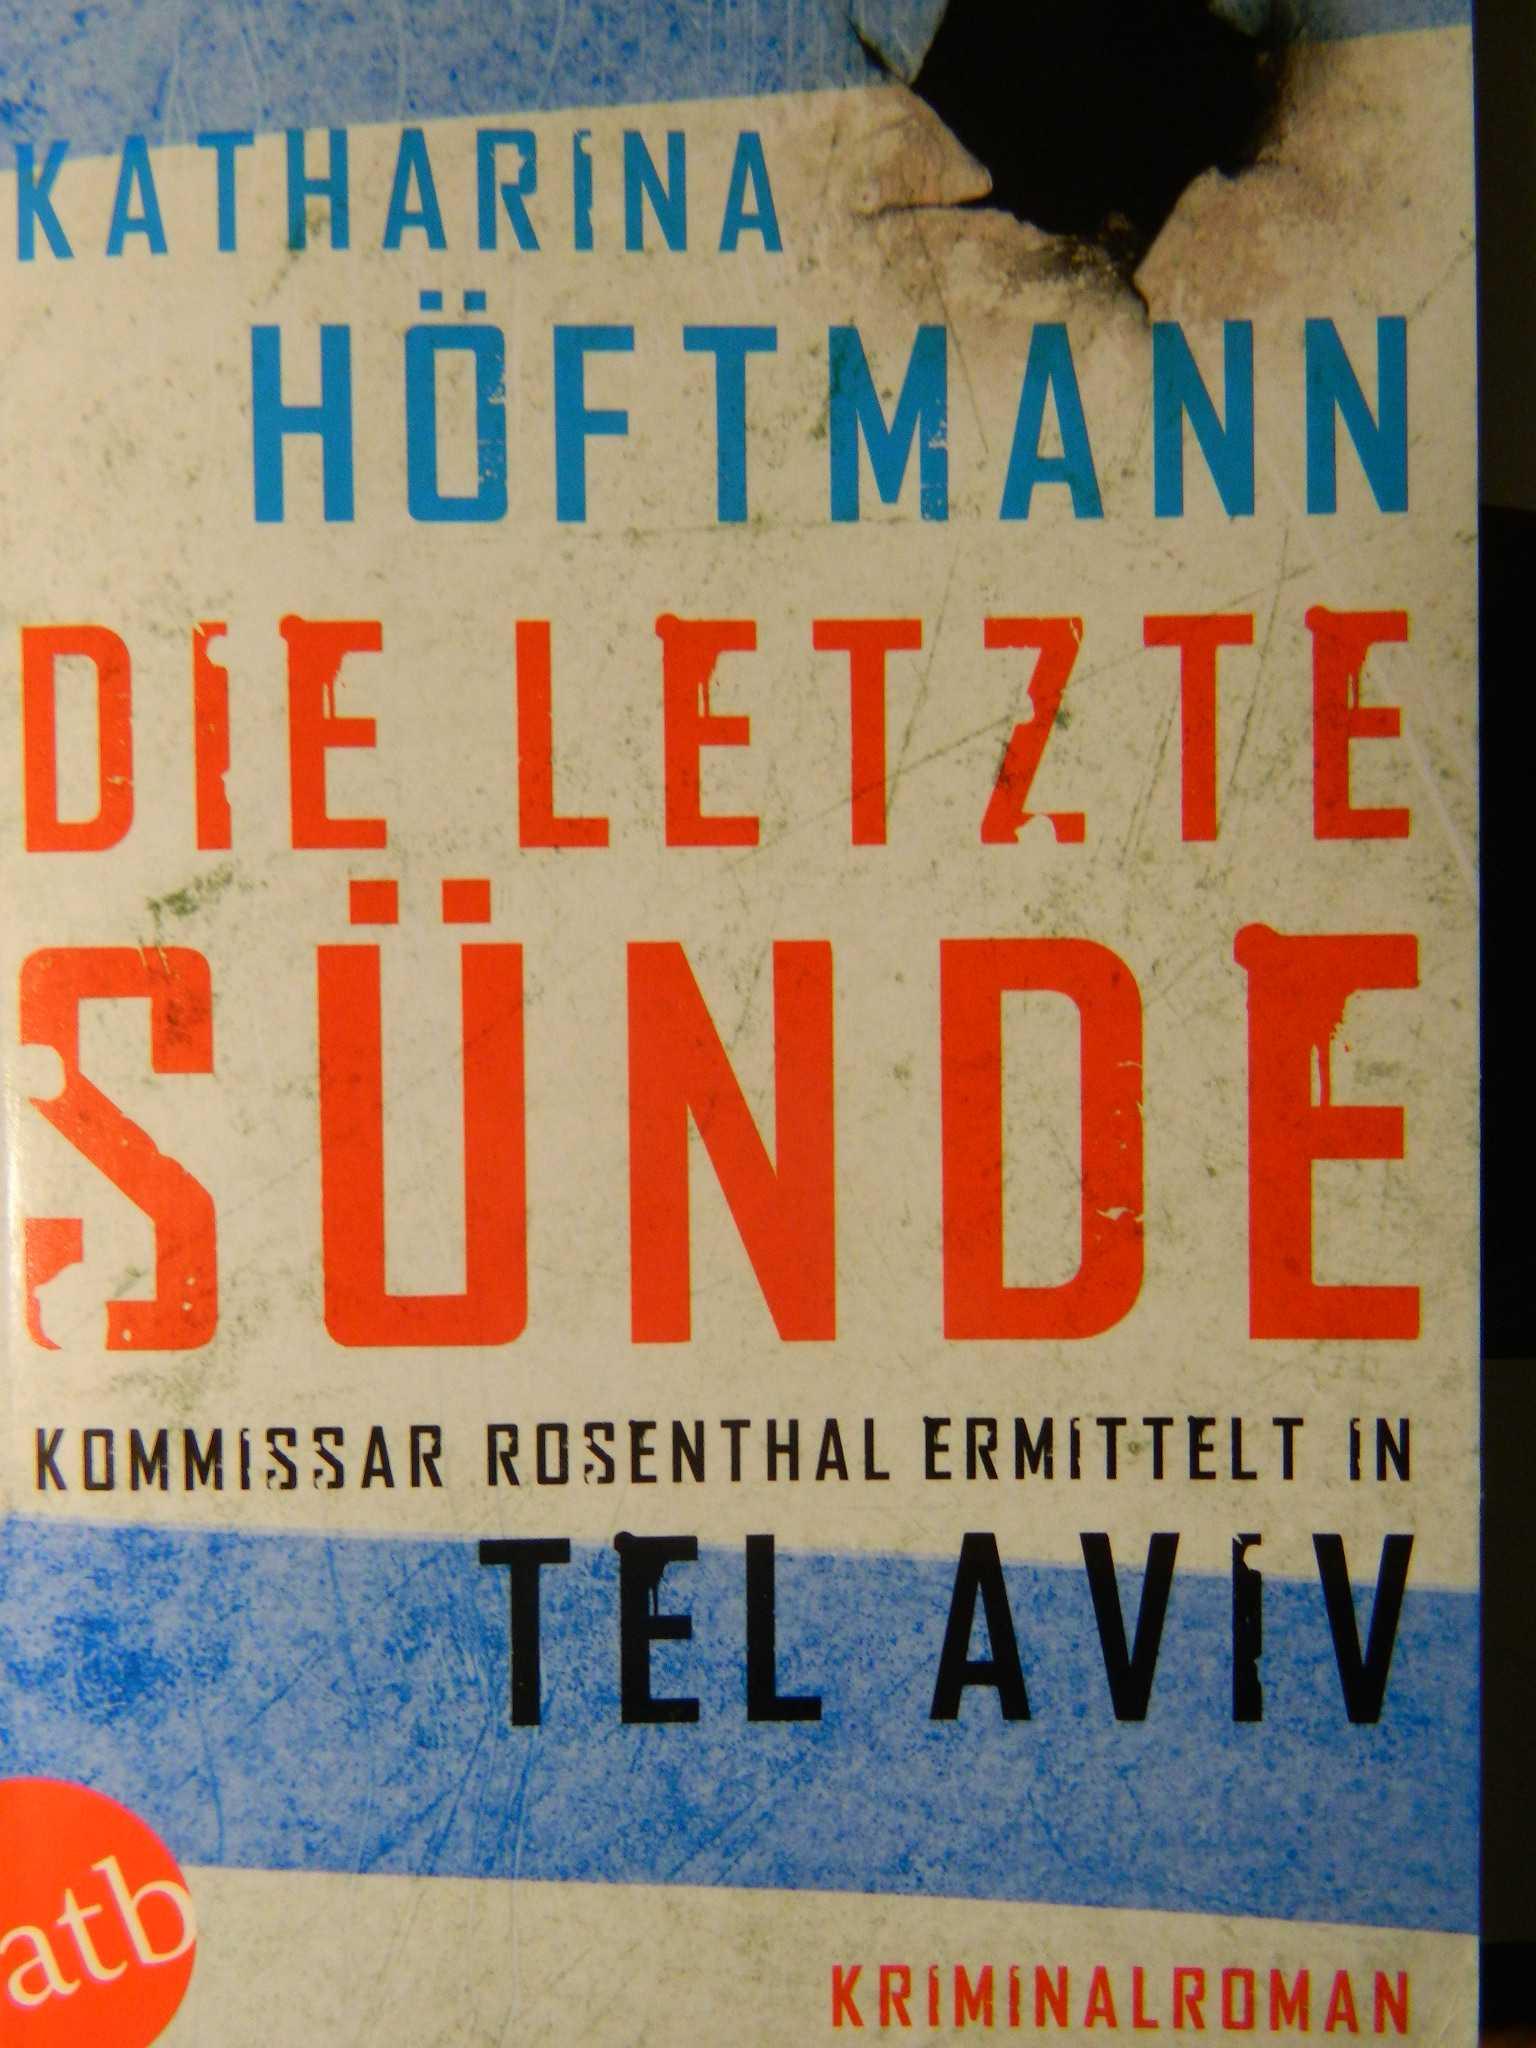 hoftmann1.jpg